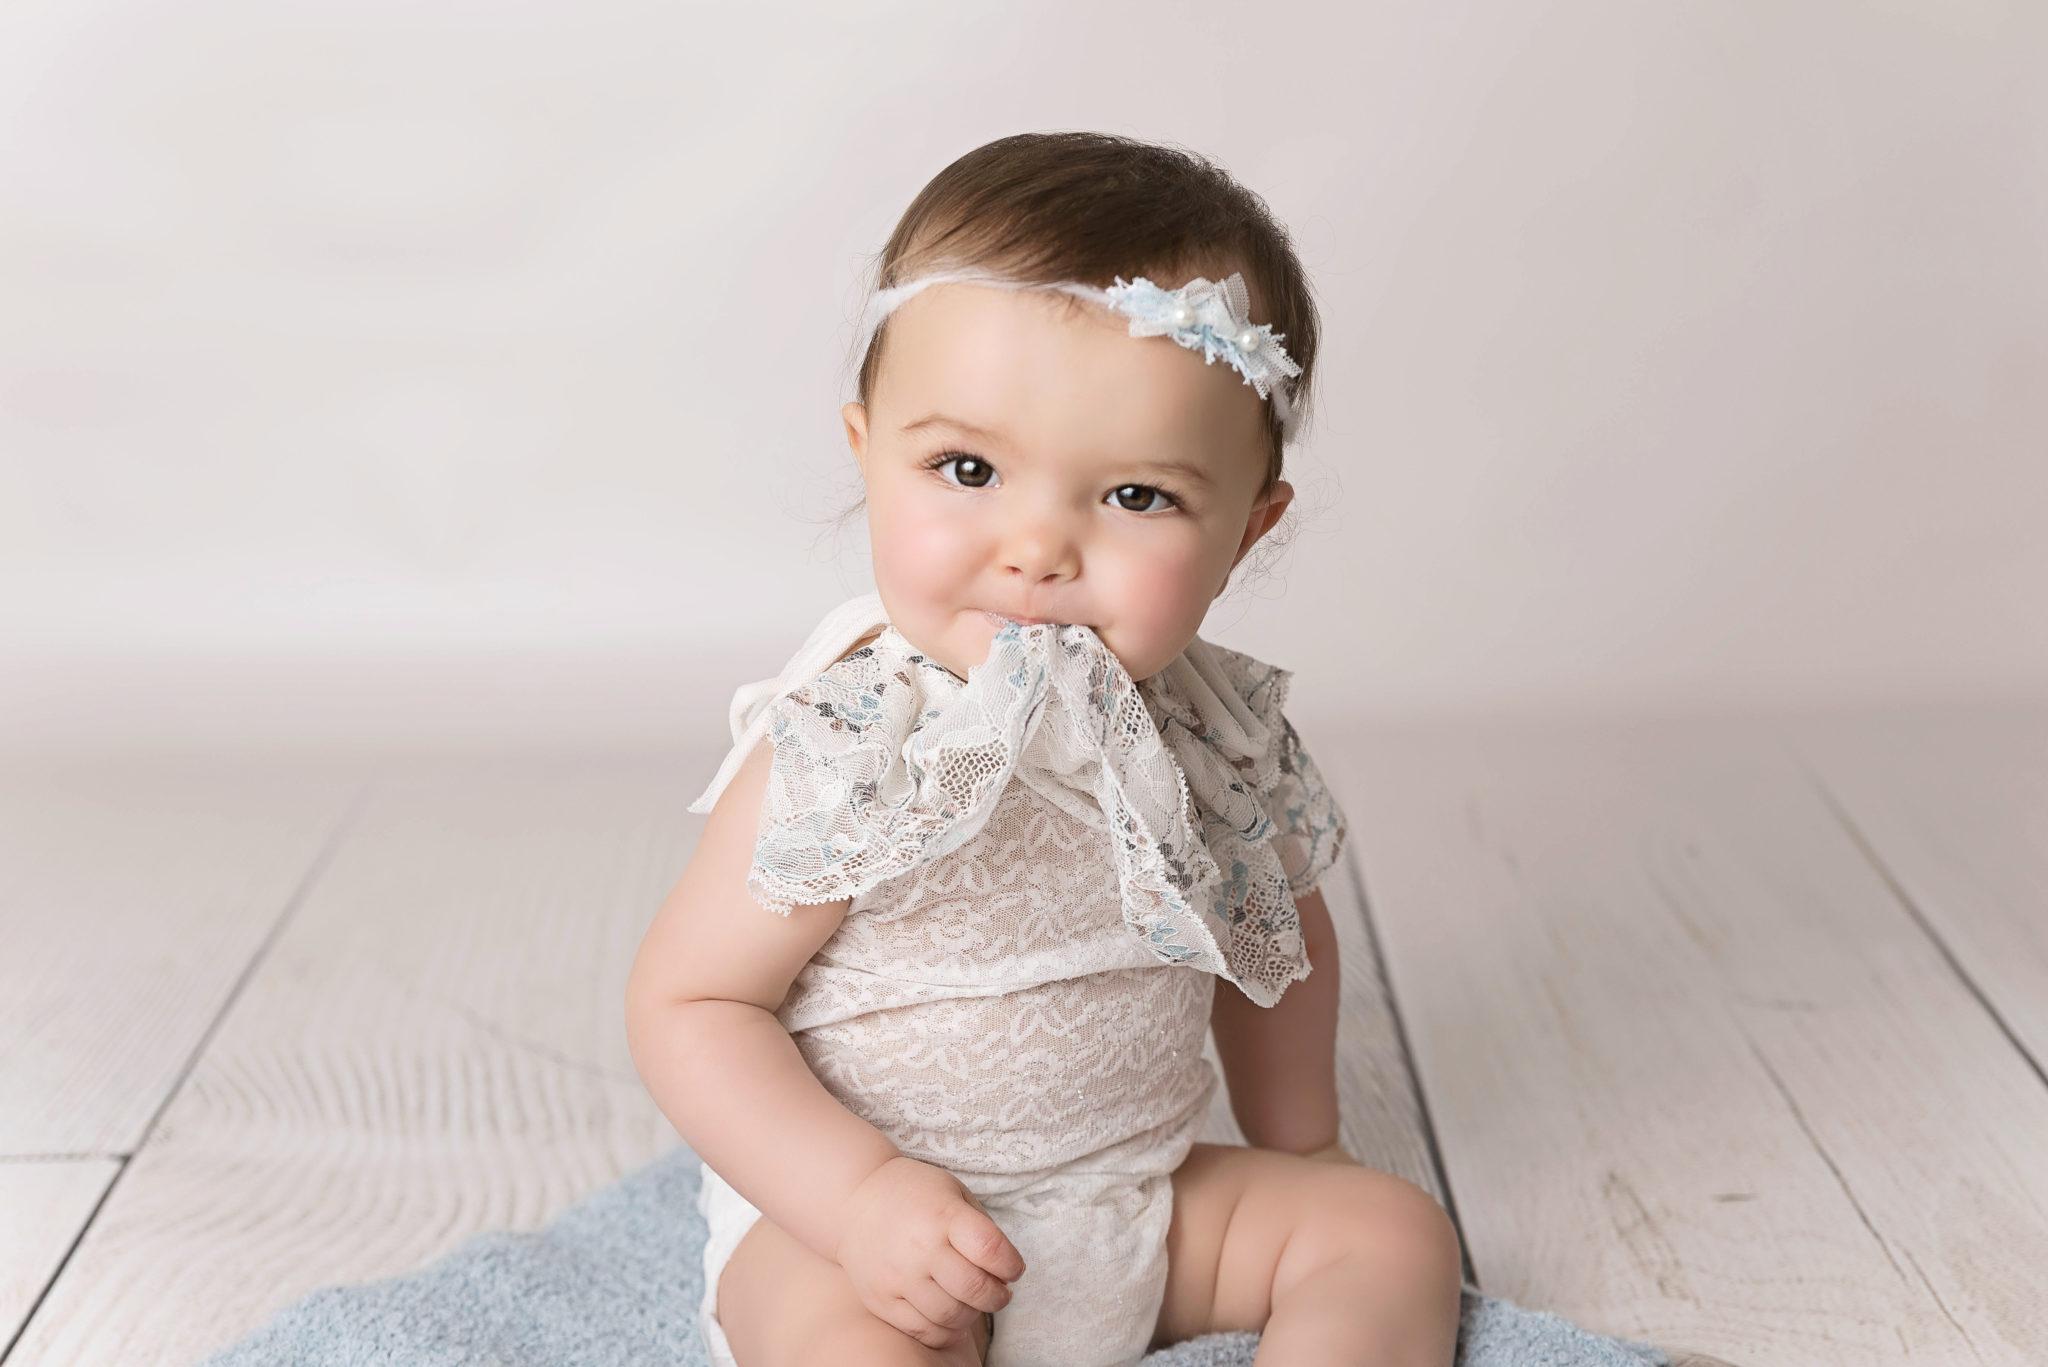 Photographe bébé oise seine et marne val d'oise ainse (24)